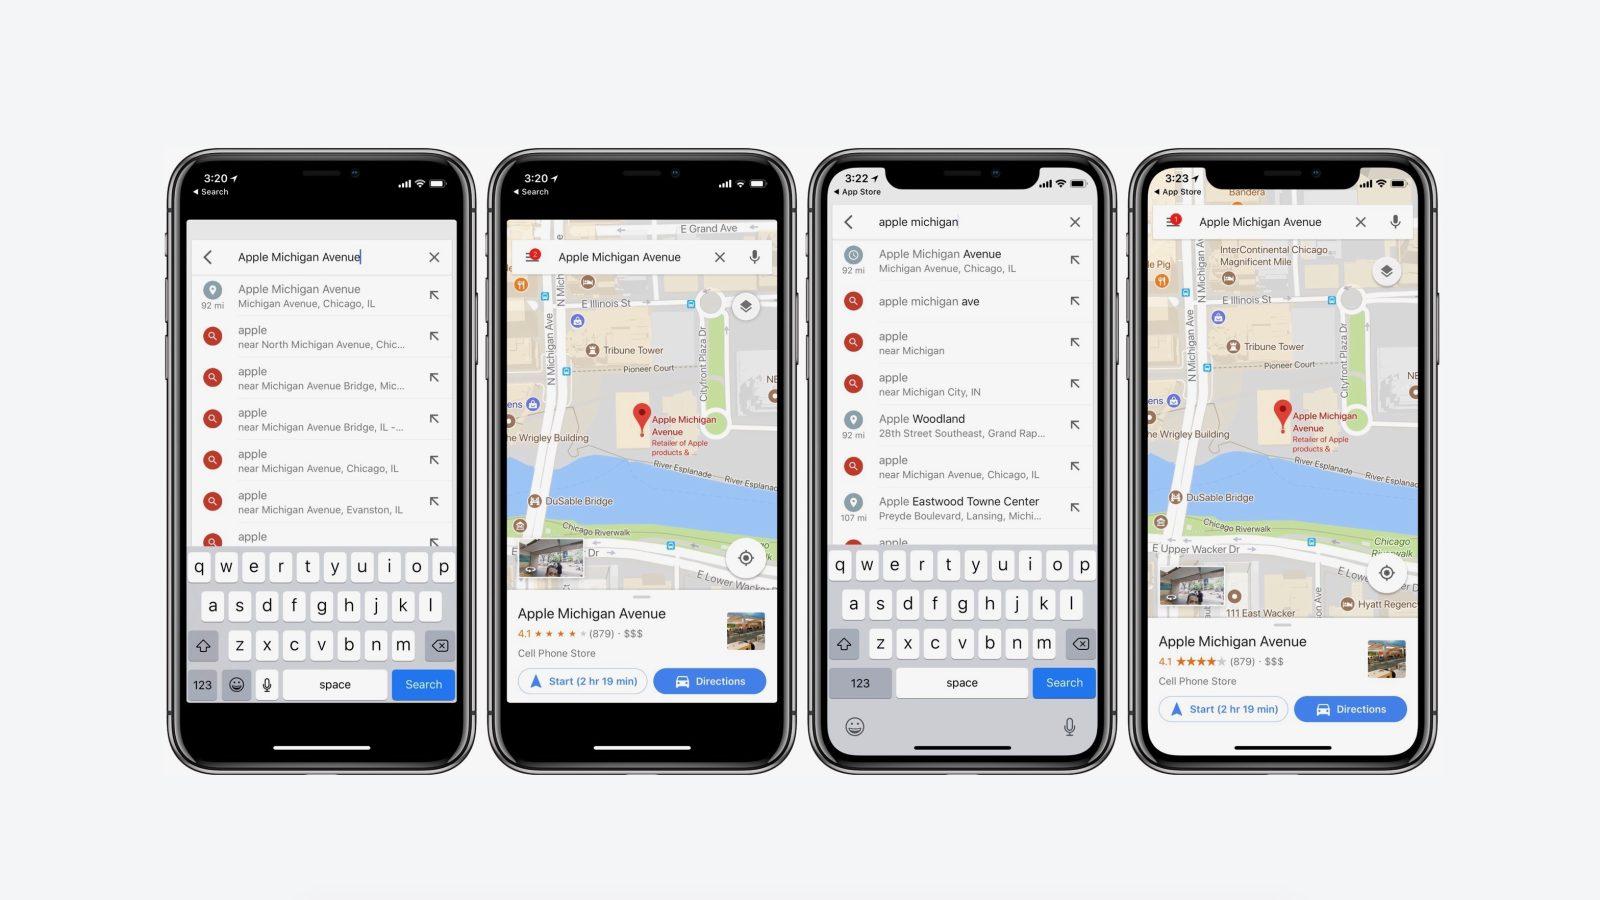 iOS版谷歌地图更新终于可以支持iPhone X